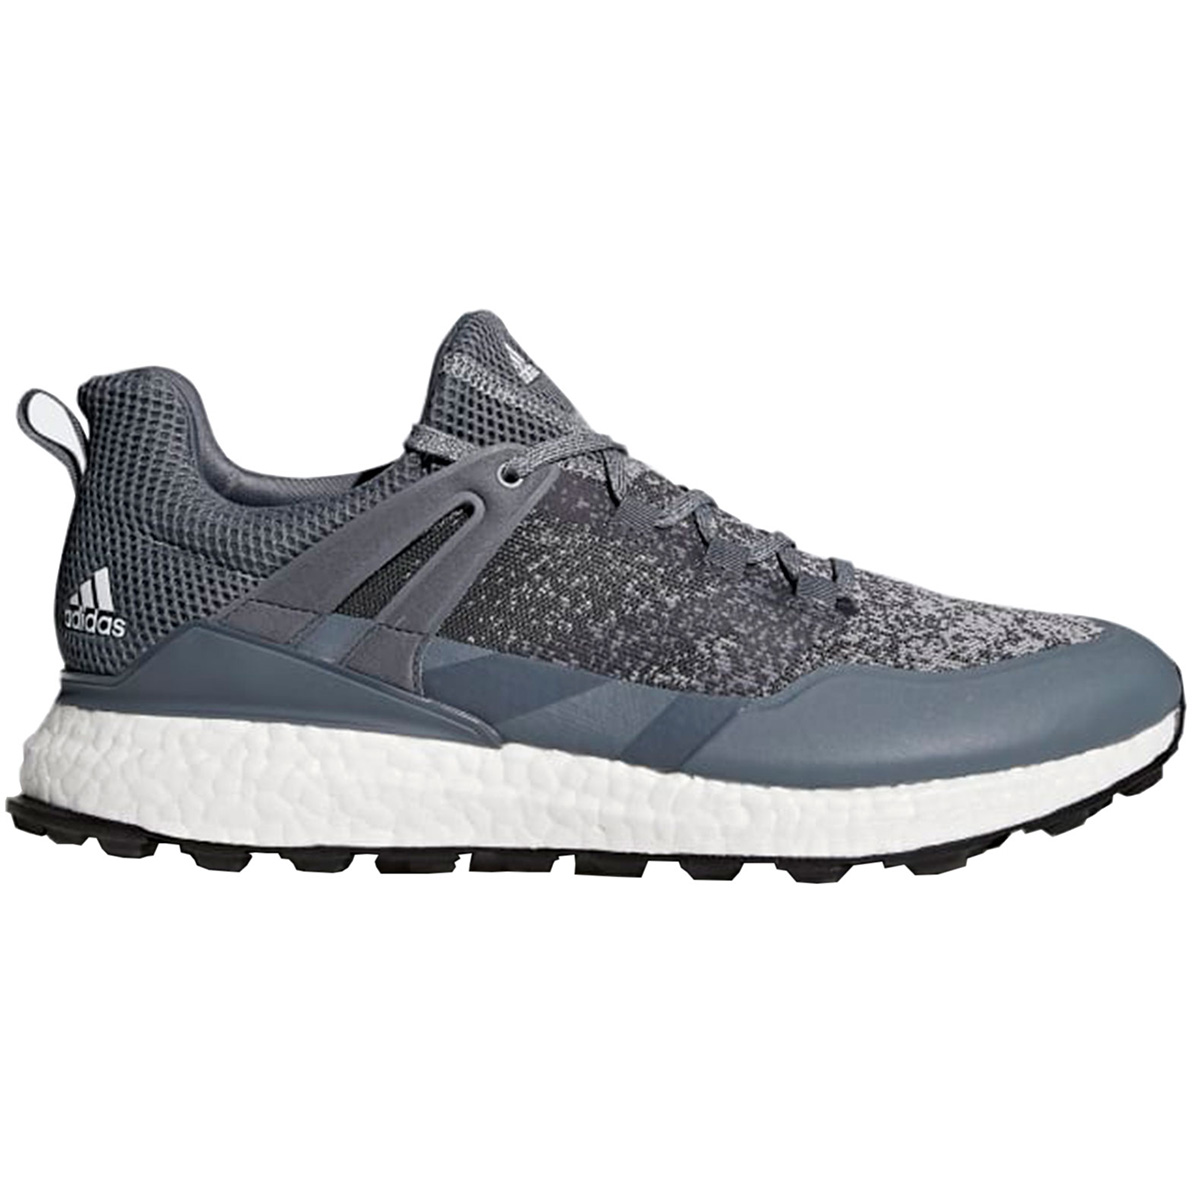 Adidas Golf Crossknit Boost Shoes Online Golf